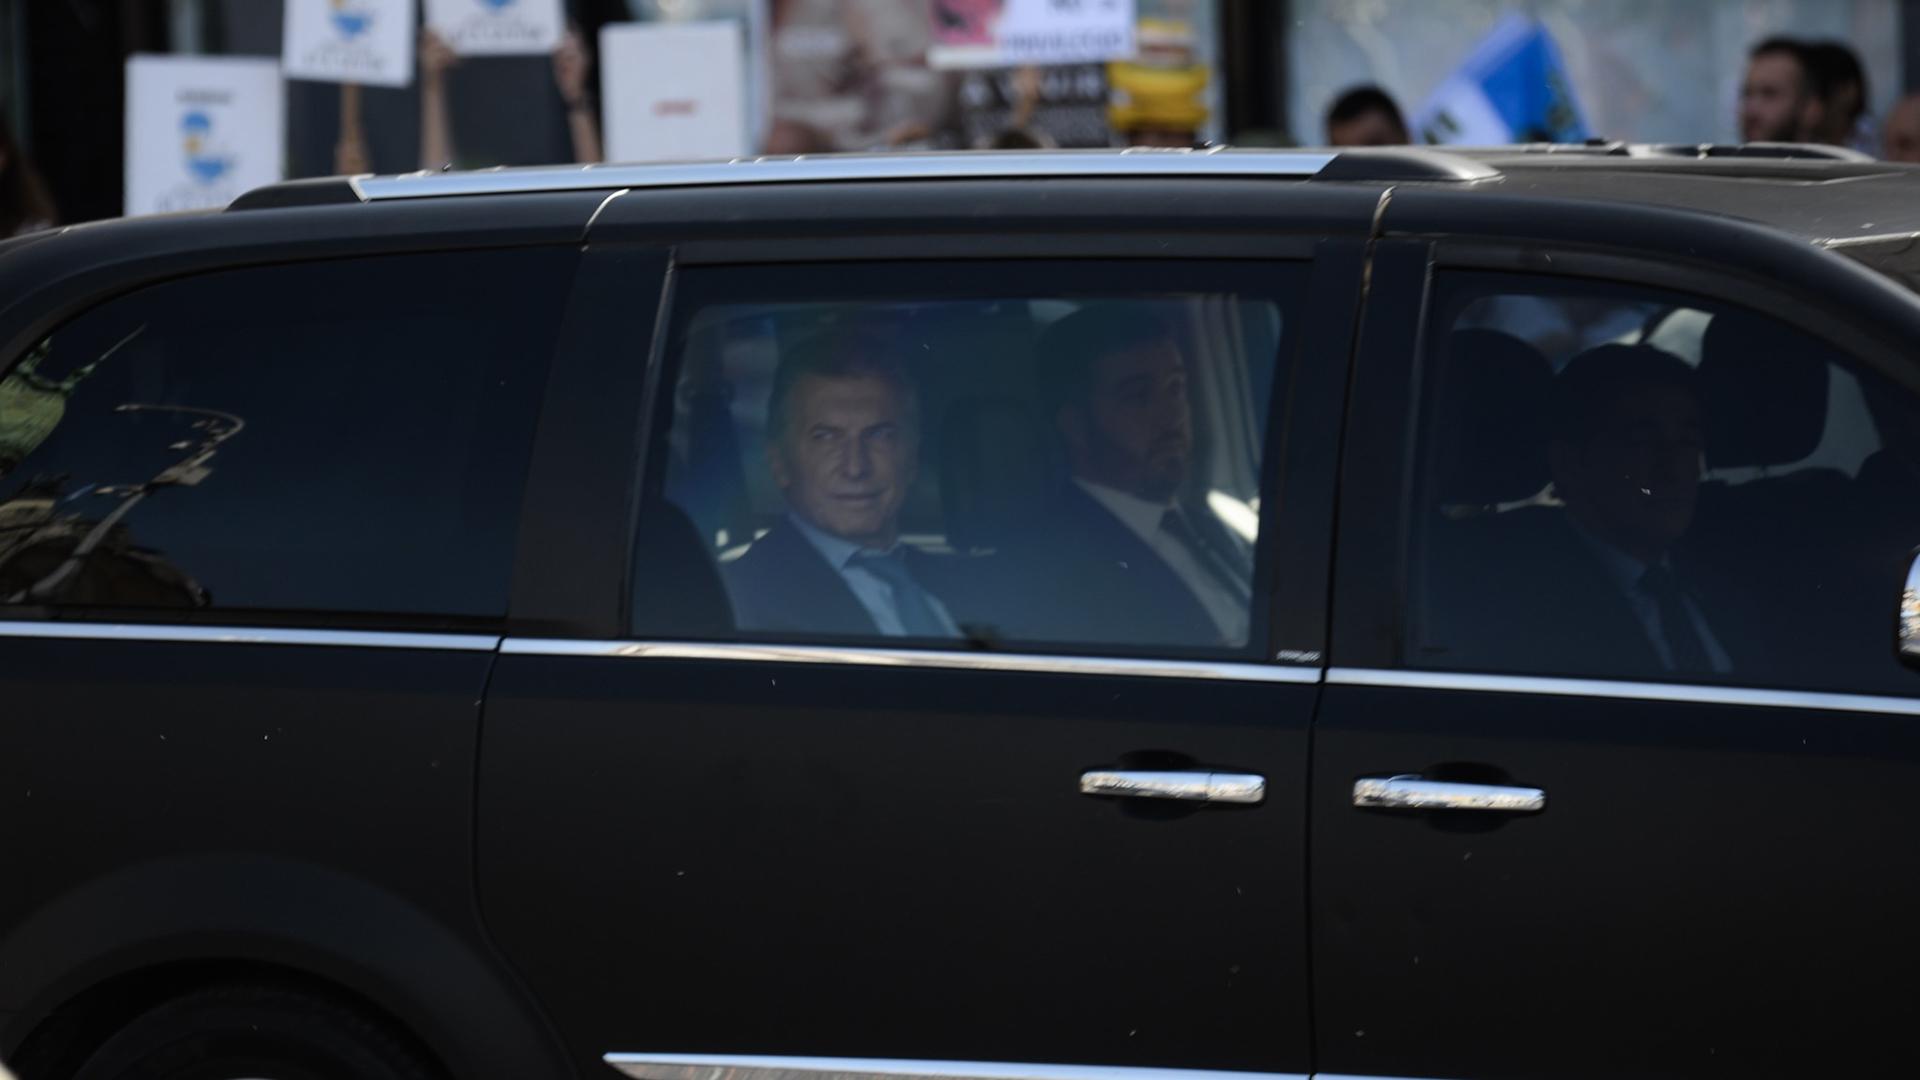 Macri arribó al Congreso en una camioneta blindada